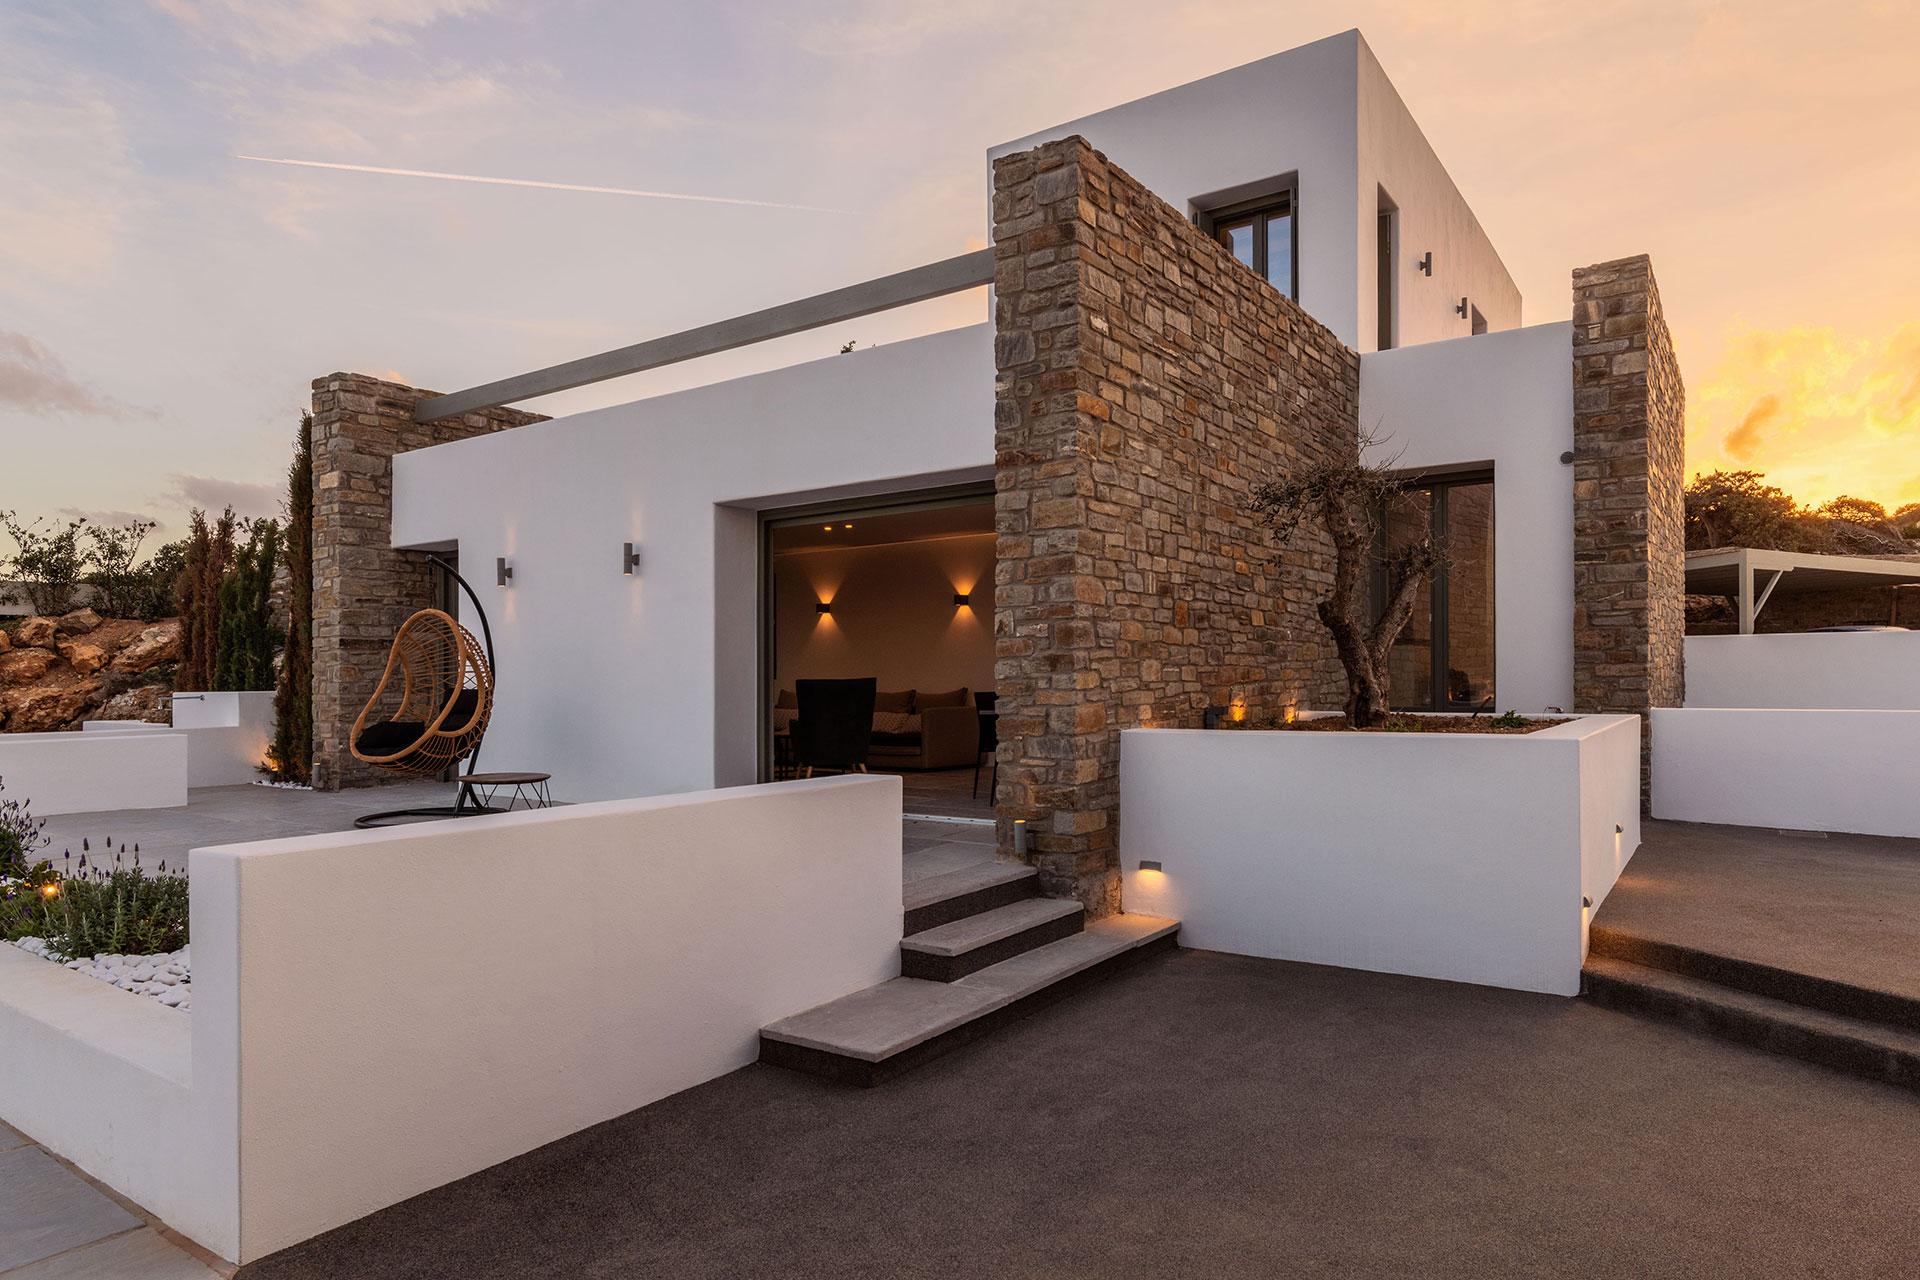 Villas in Santa Maria - Yliessa 21